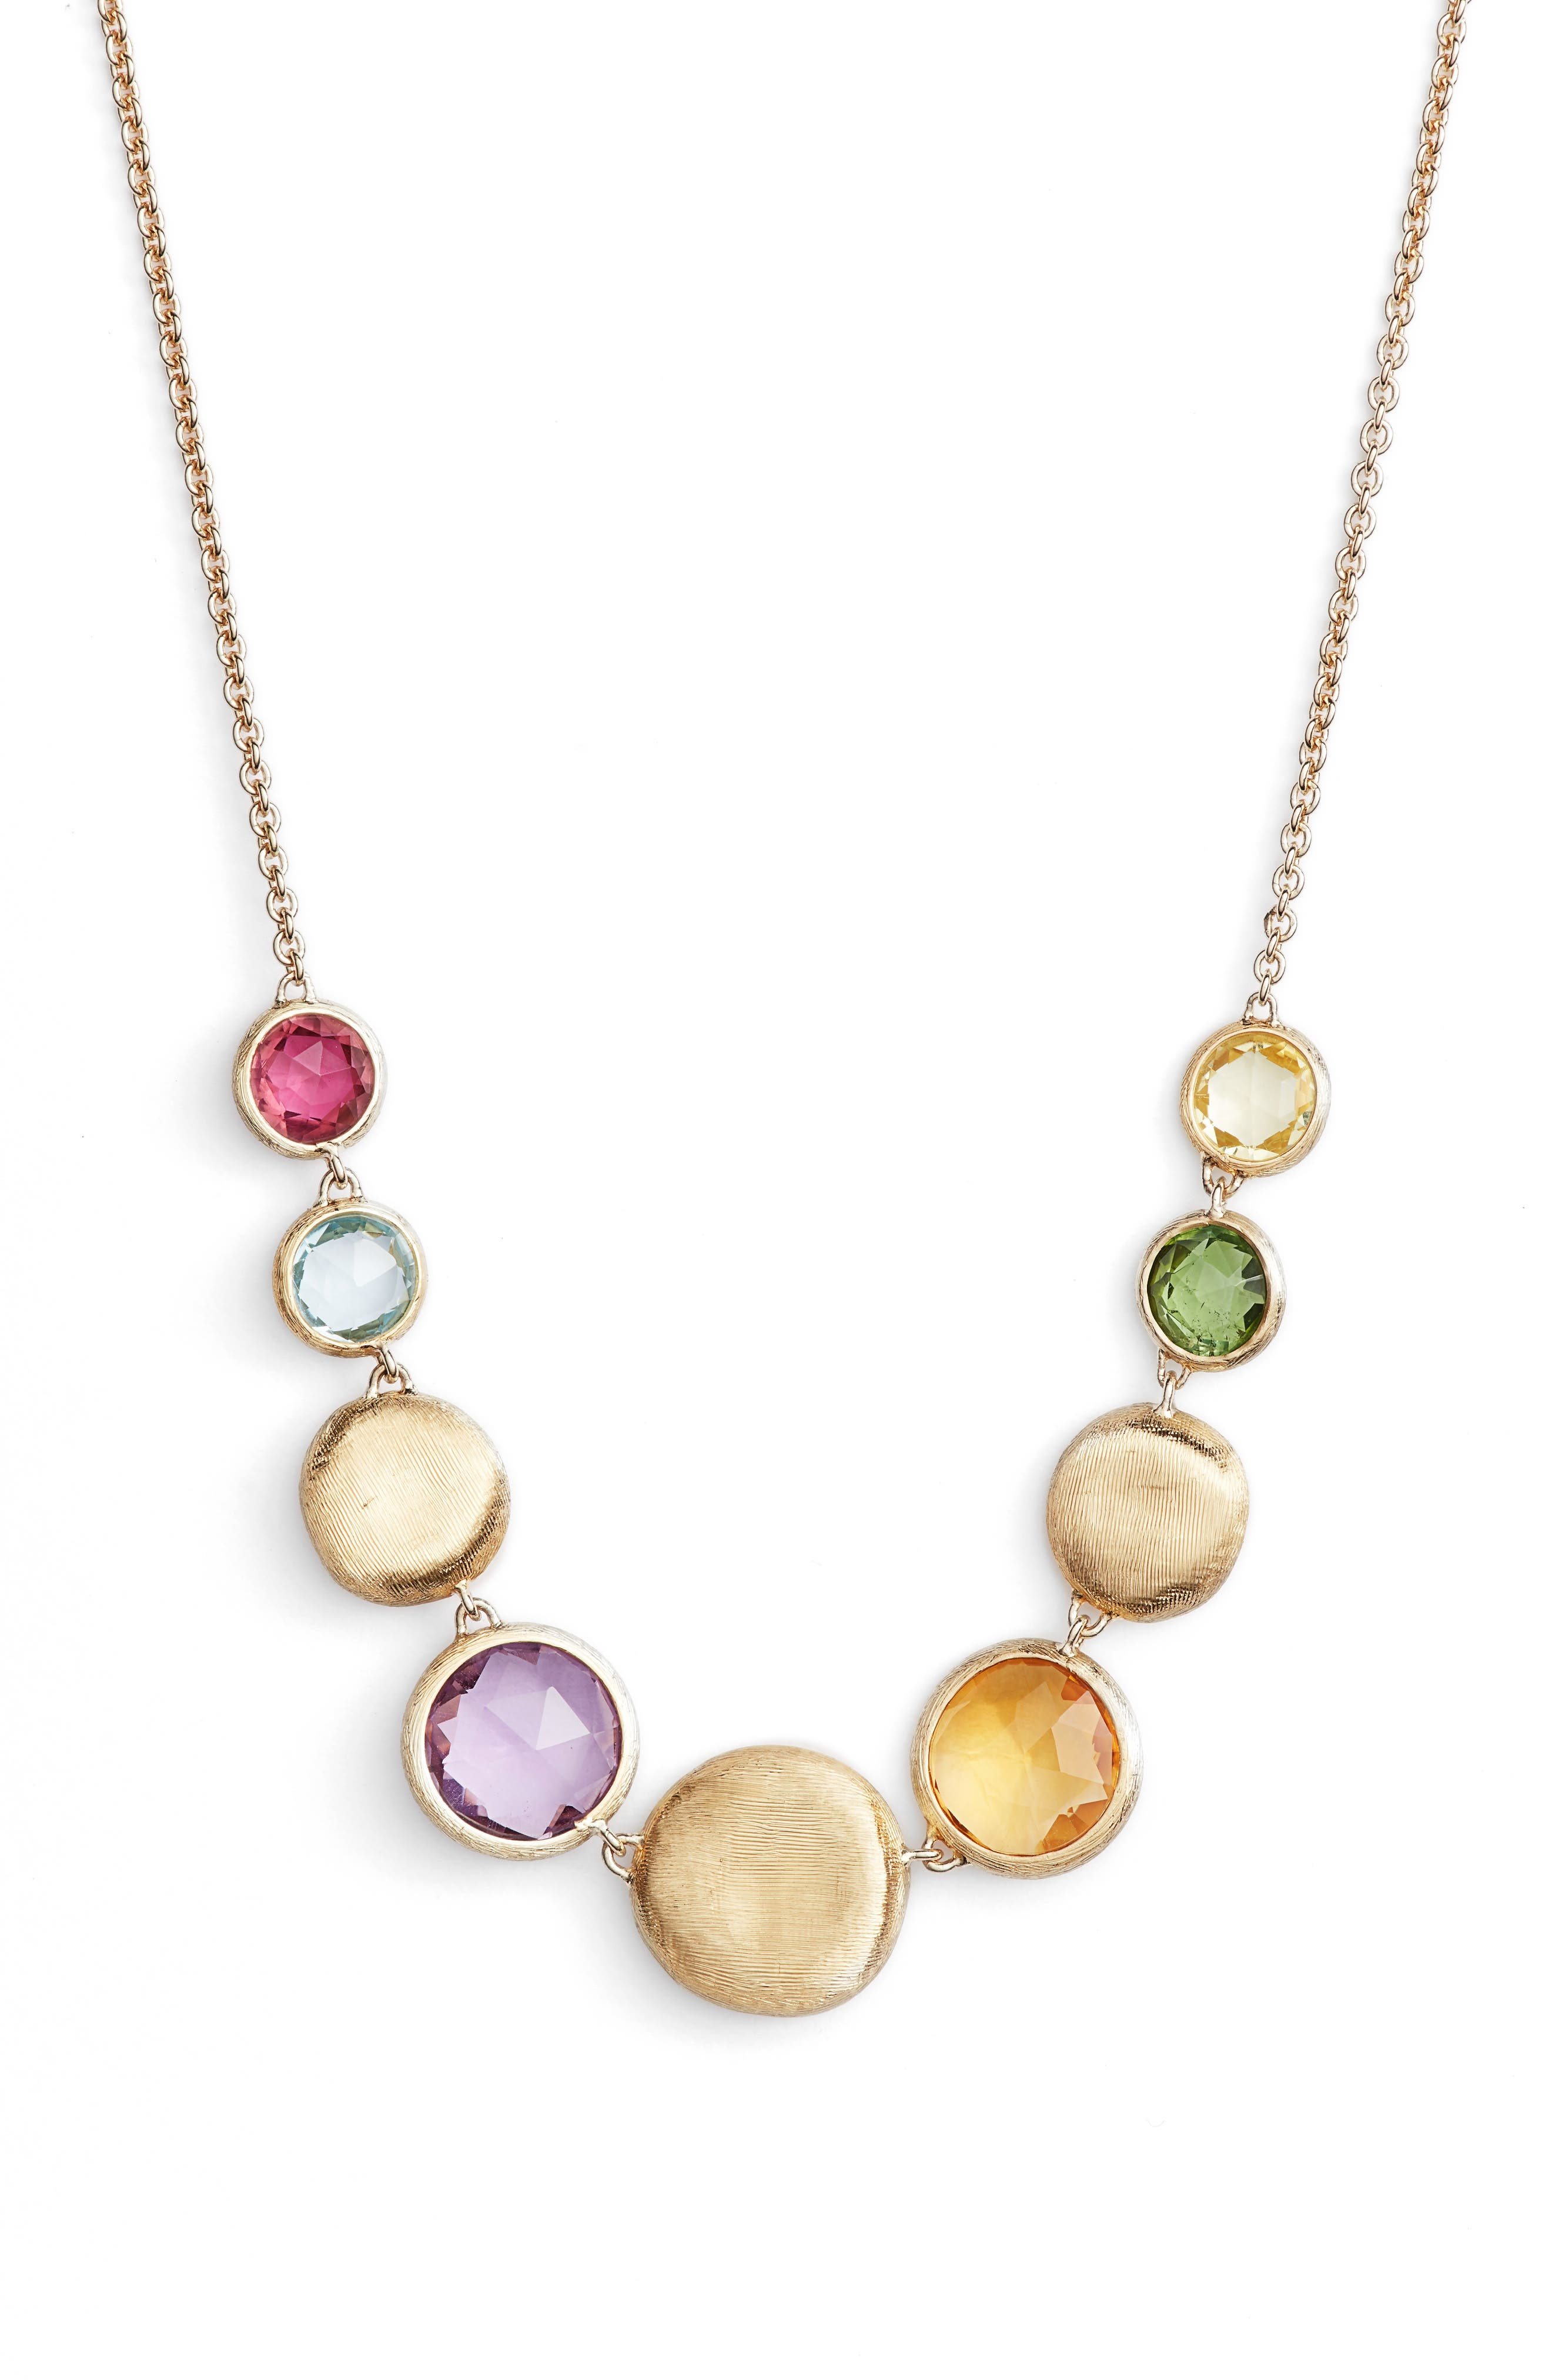 Marco Bicego Jaipur Semiprecious Stone Collar Necklace